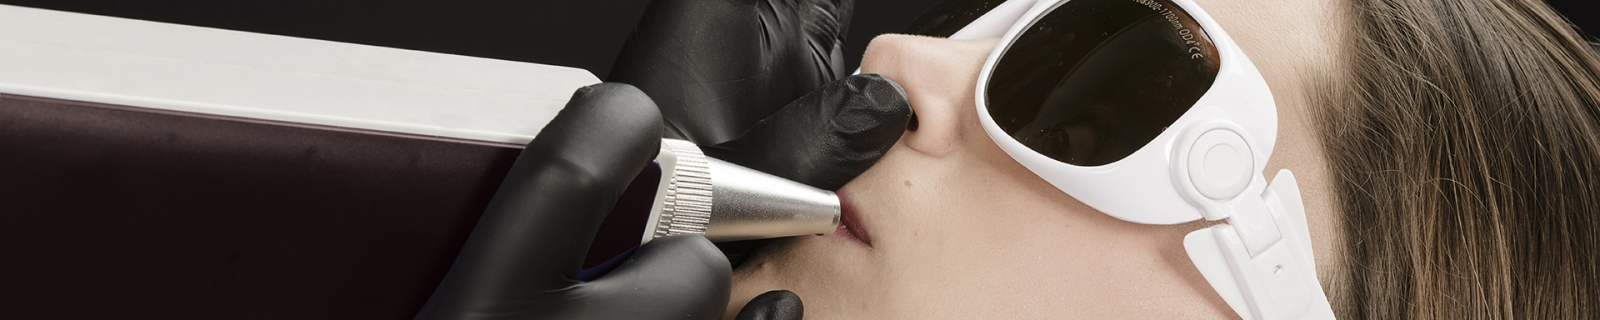 laserowe usuwanie makijażu tatuażu i makijażu permanentnego